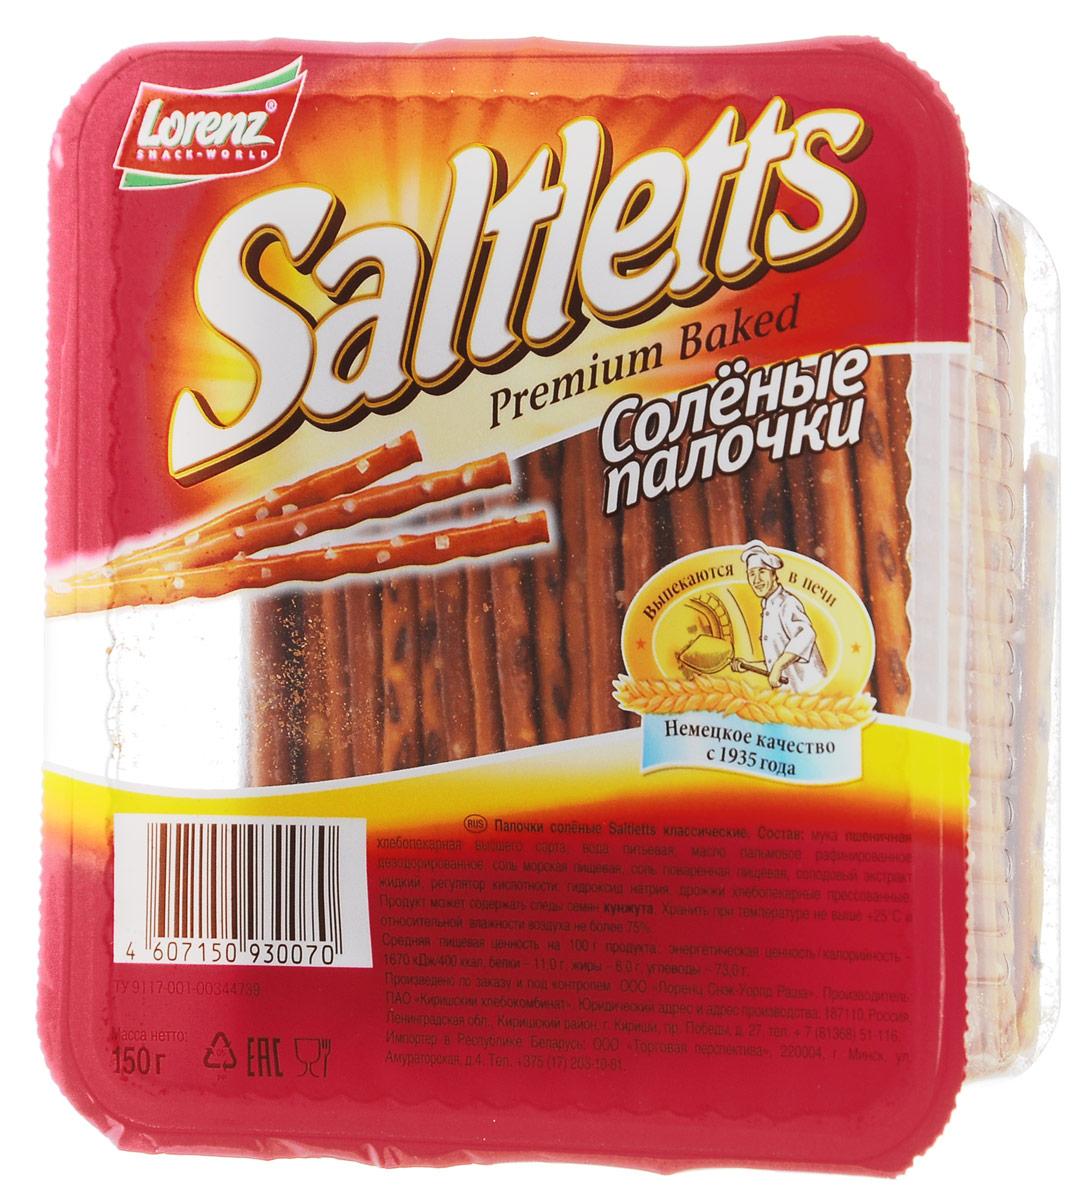 Lorenz Saltletts палочки cоленые, 150 г